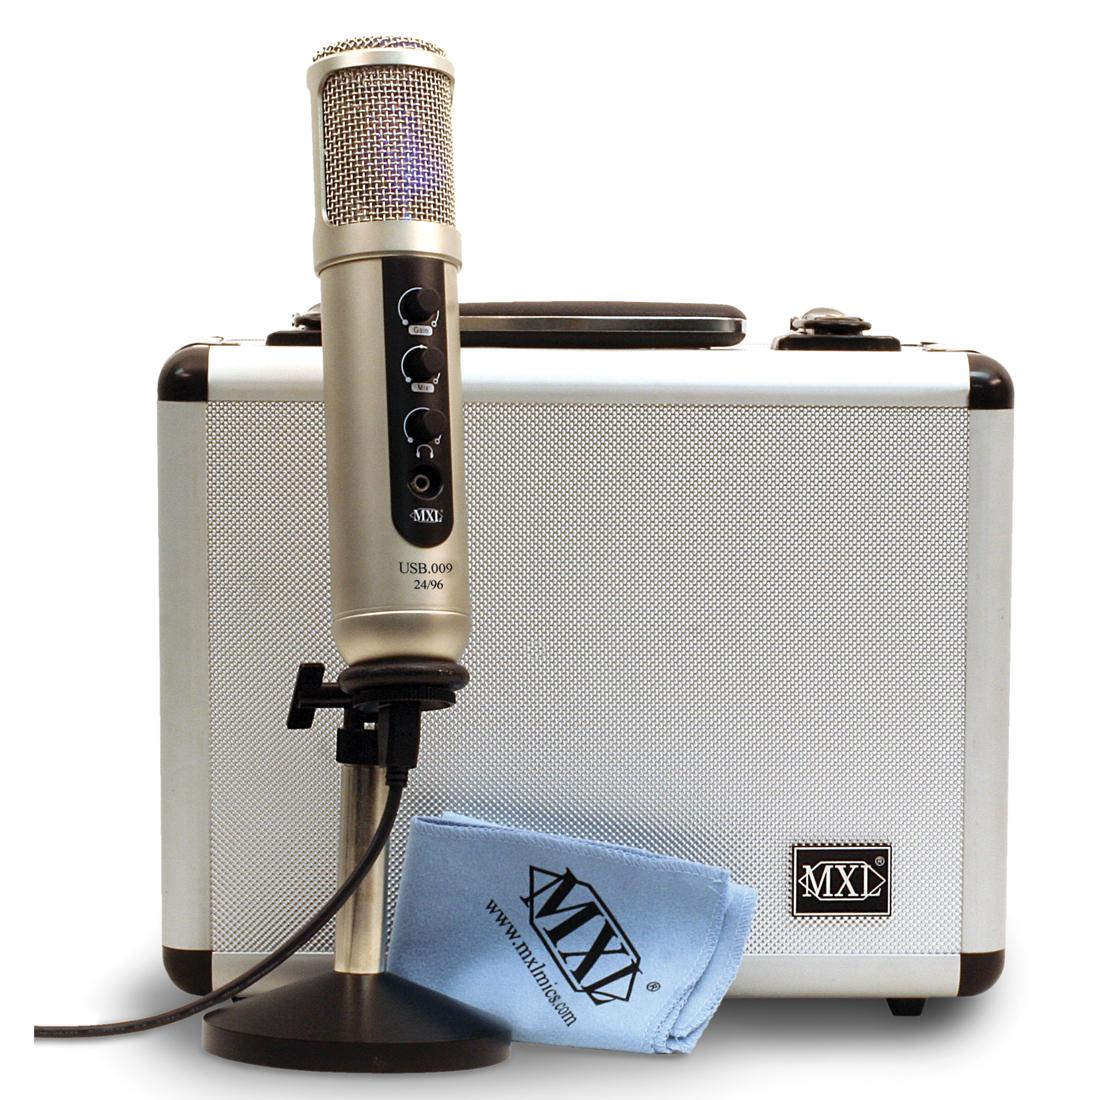 MXL USB.009